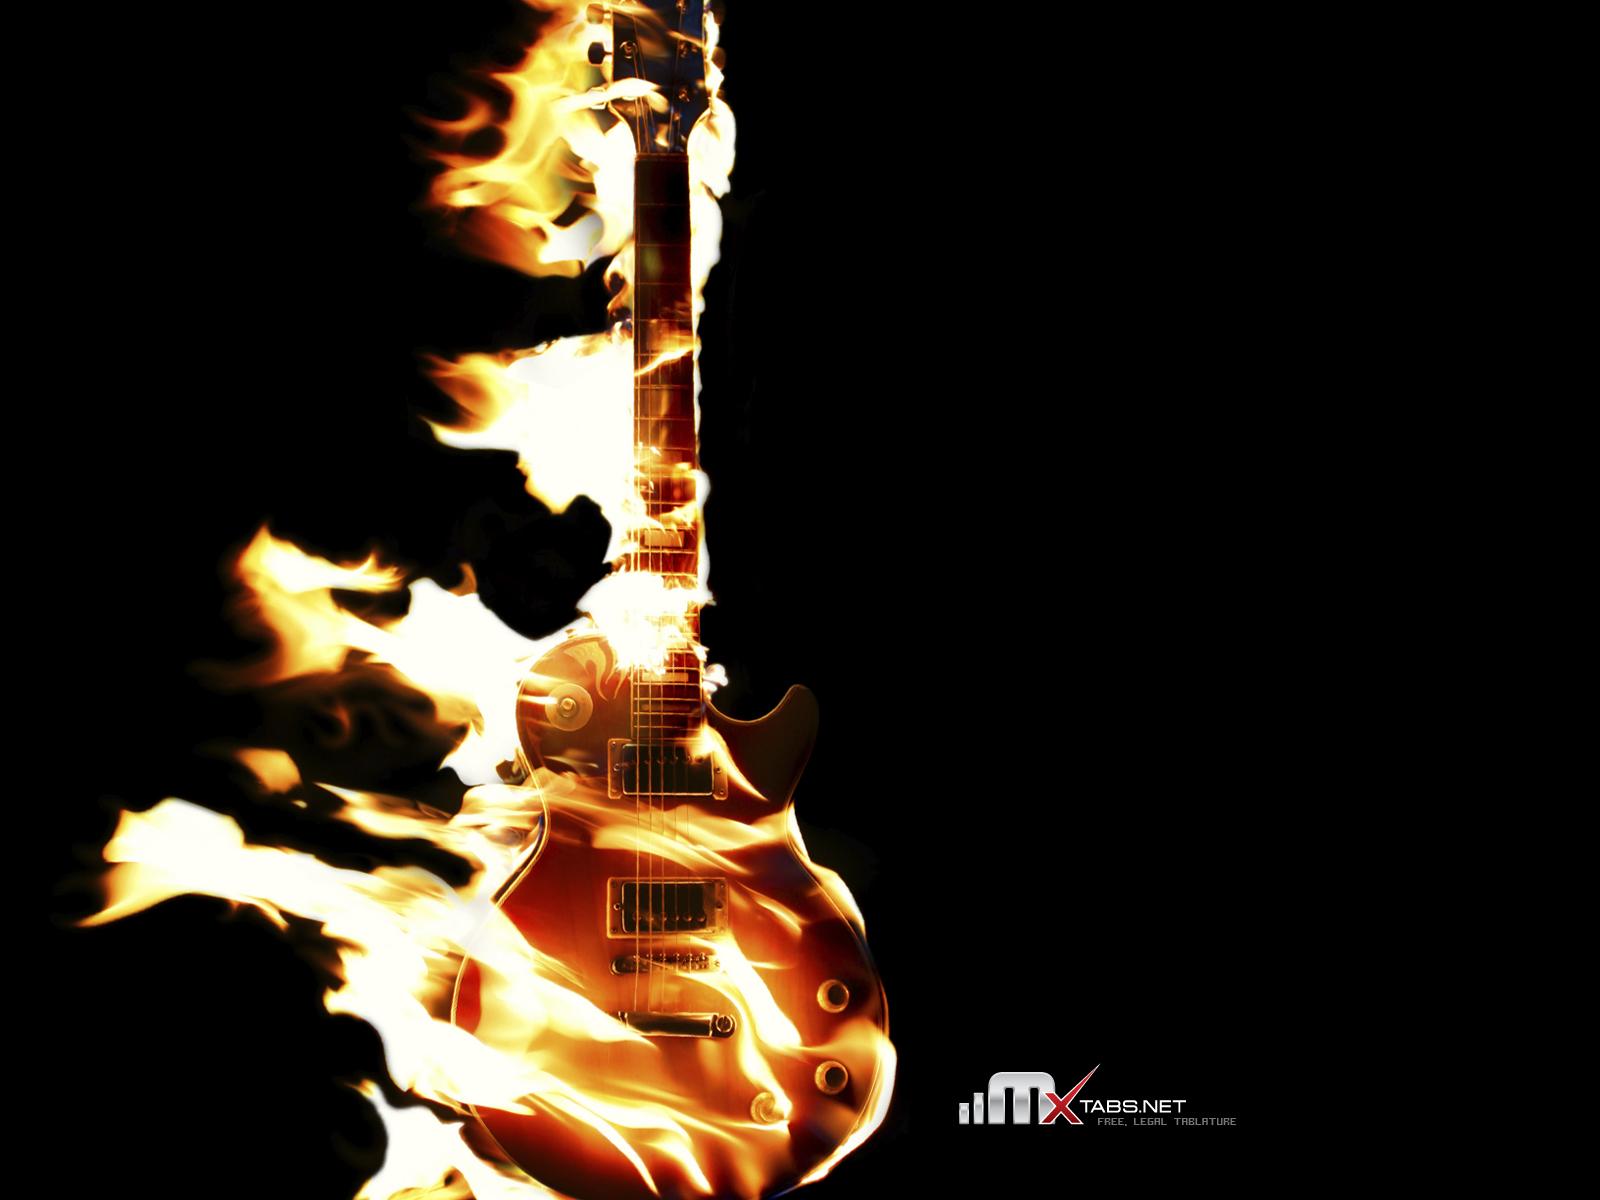 http://1.bp.blogspot.com/-UF-Vd2UXJo0/TxVhBafAp3I/AAAAAAAAFbA/nAFruqjY8ts/s1600/Guitar-HD-Wallpaper-24.jpg